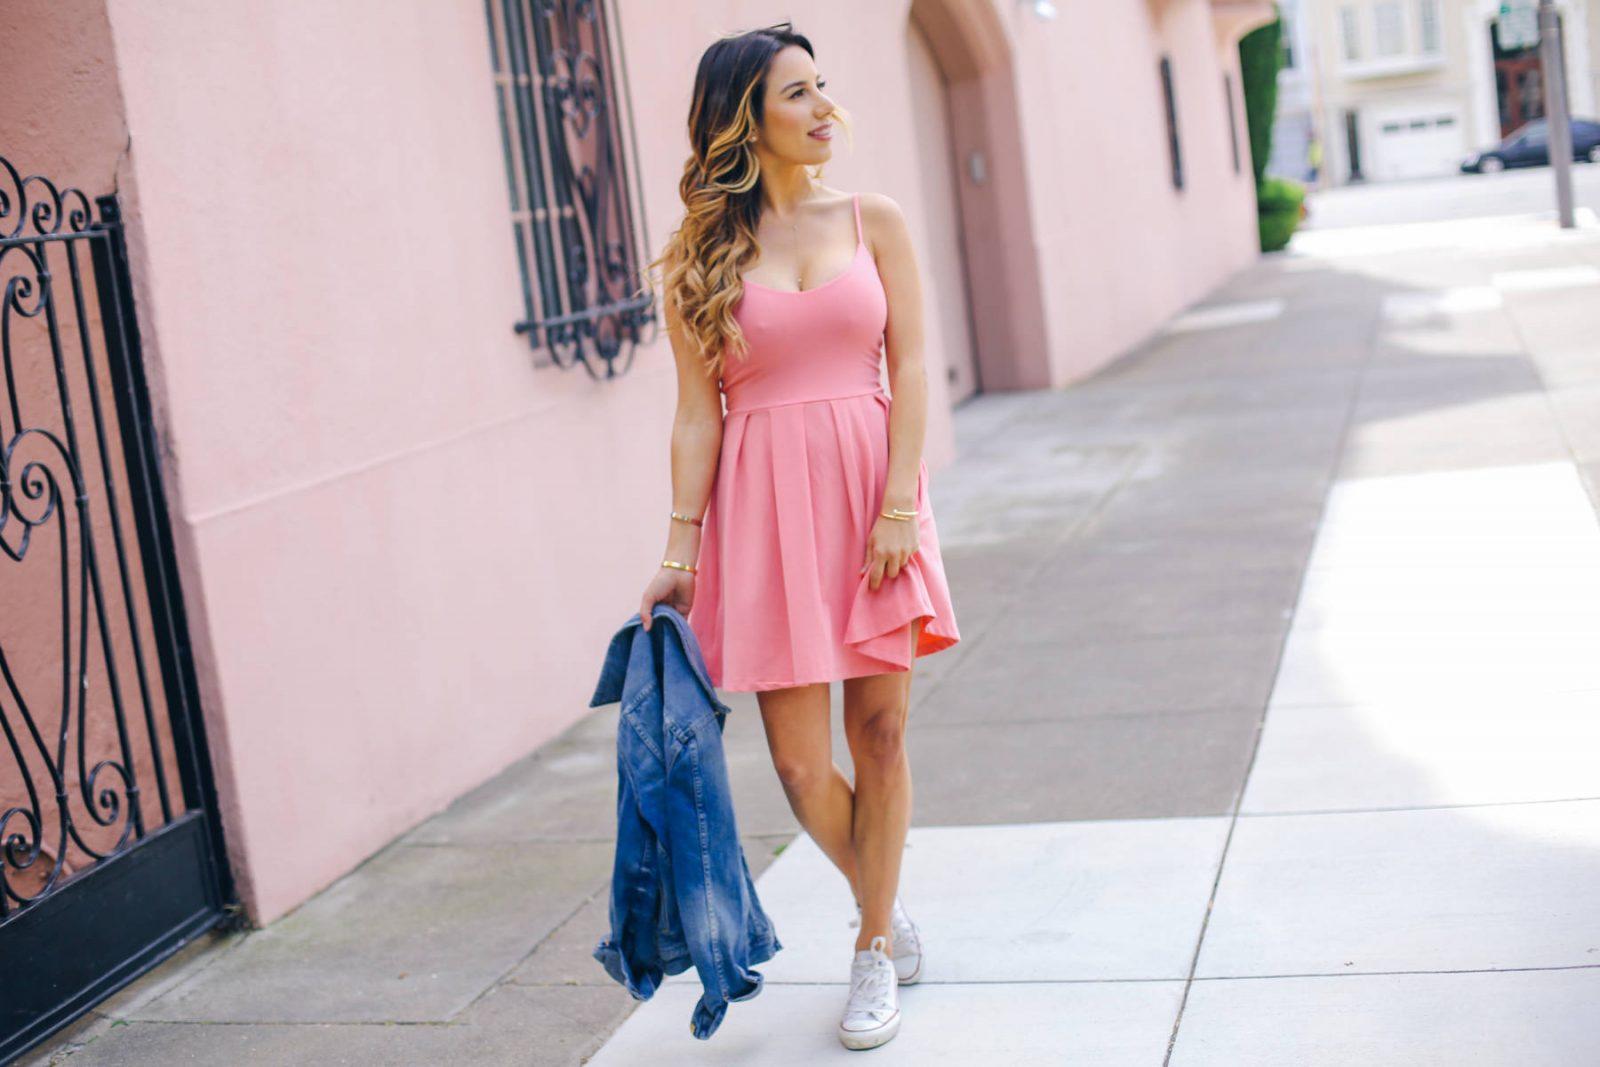 pink-skater-dress-ariana-lauren-fashionborn-san-francisco-ryanbyryanchua-9166